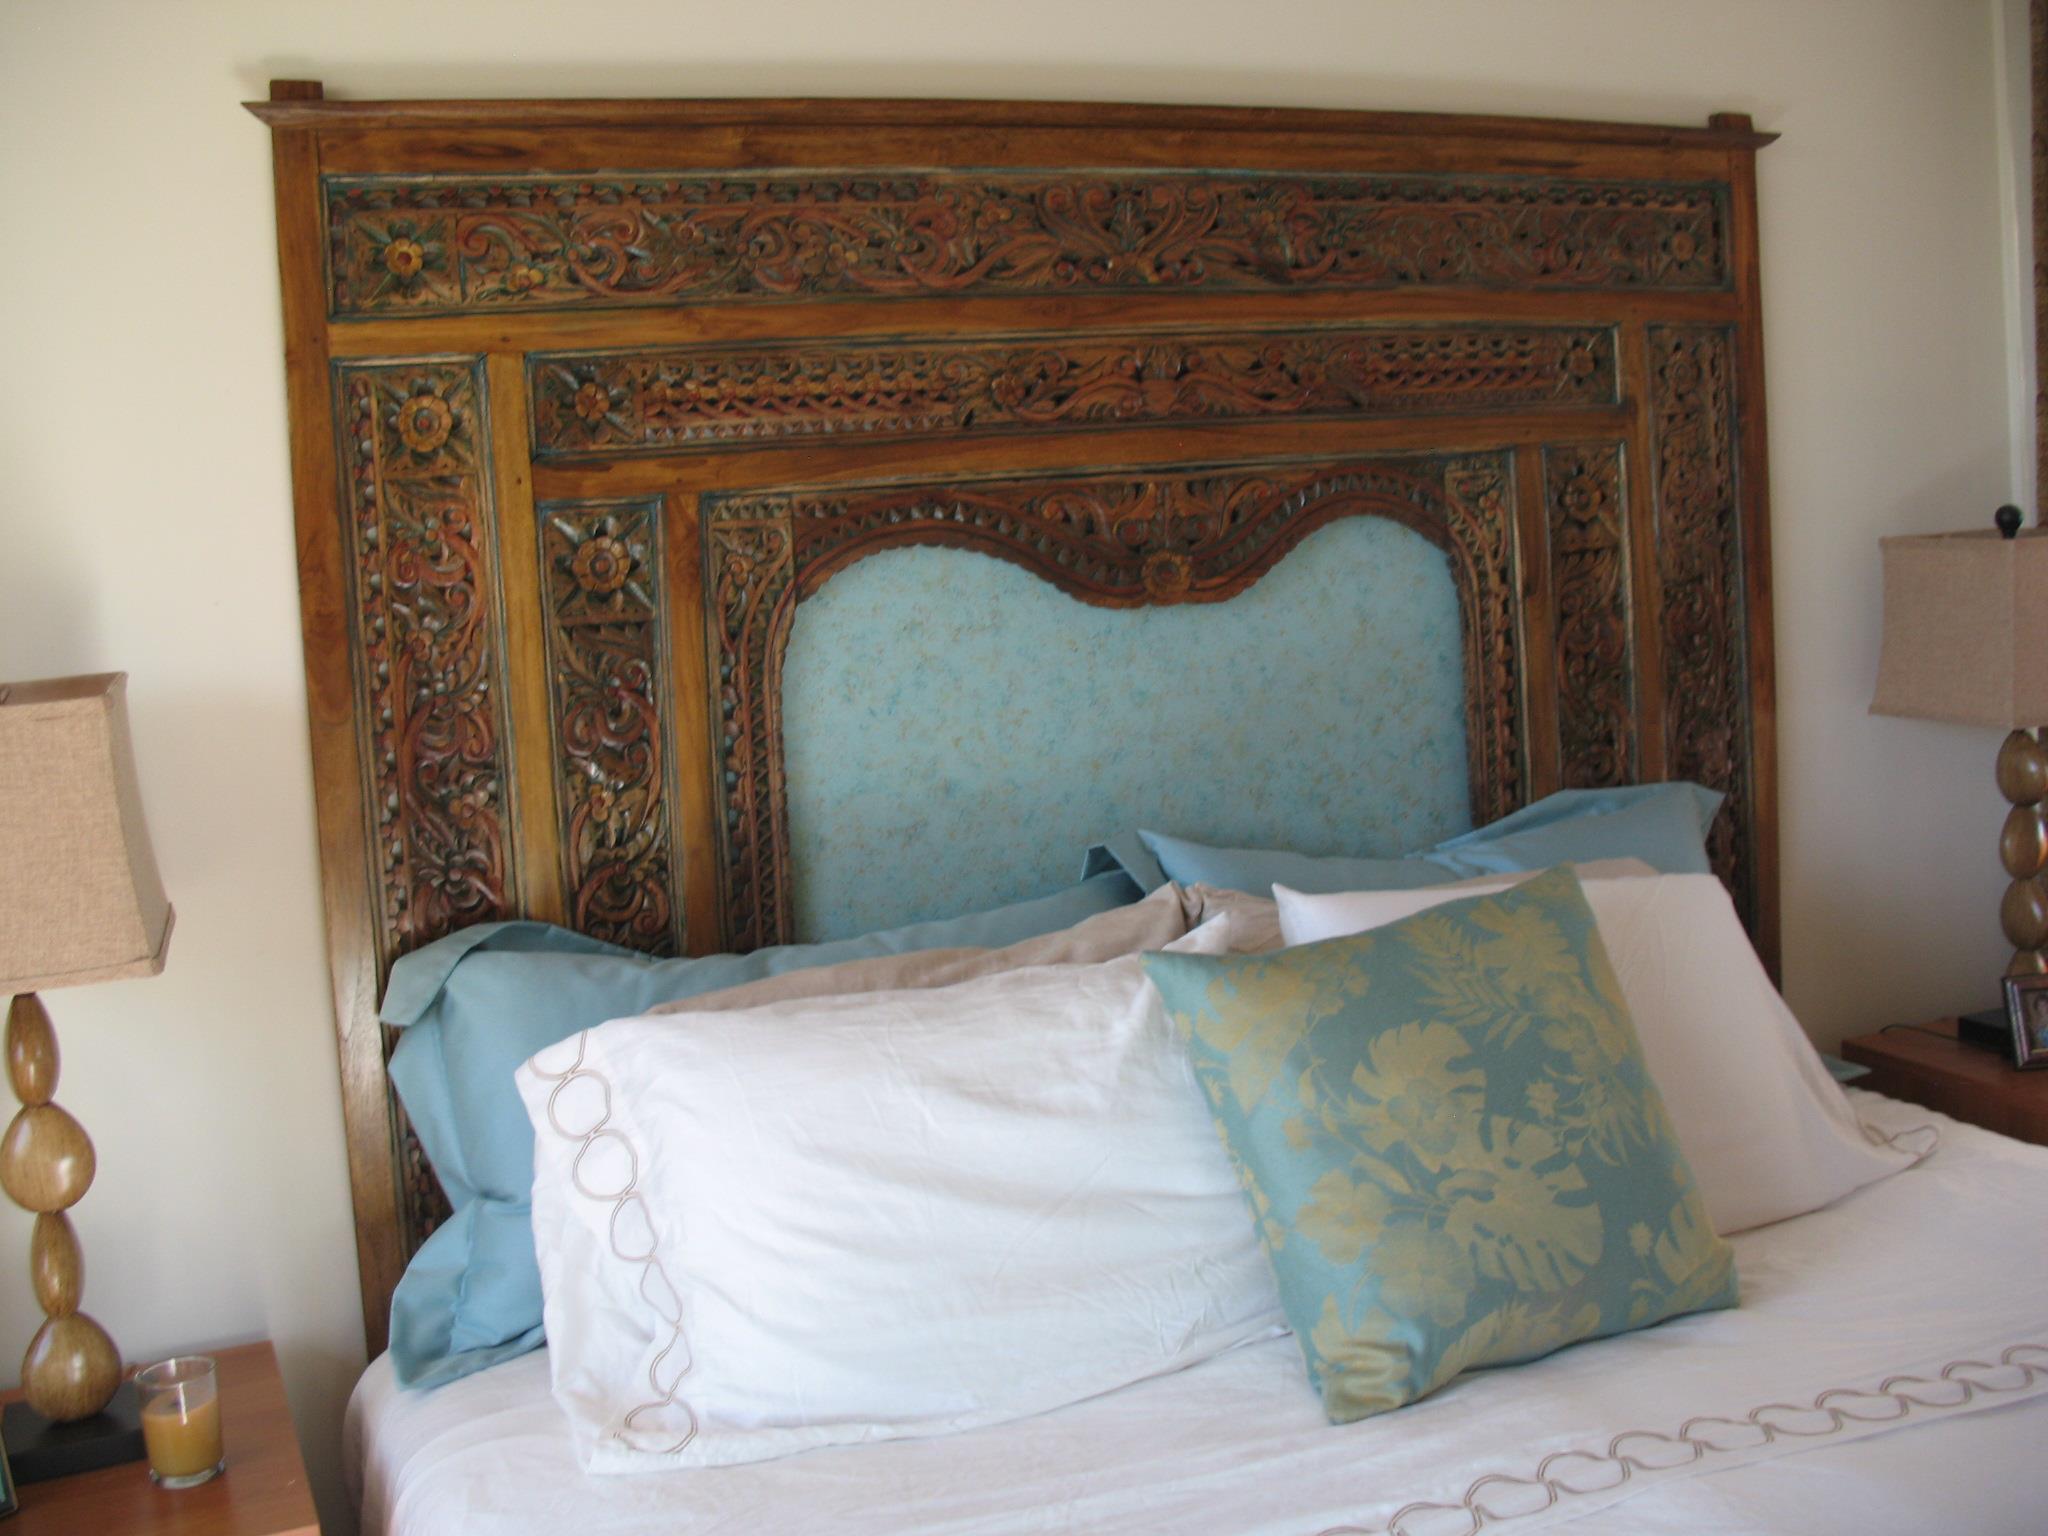 Indonesian carved bed panel as headboard gado gado - Bedroom furniture made in indonesia ...